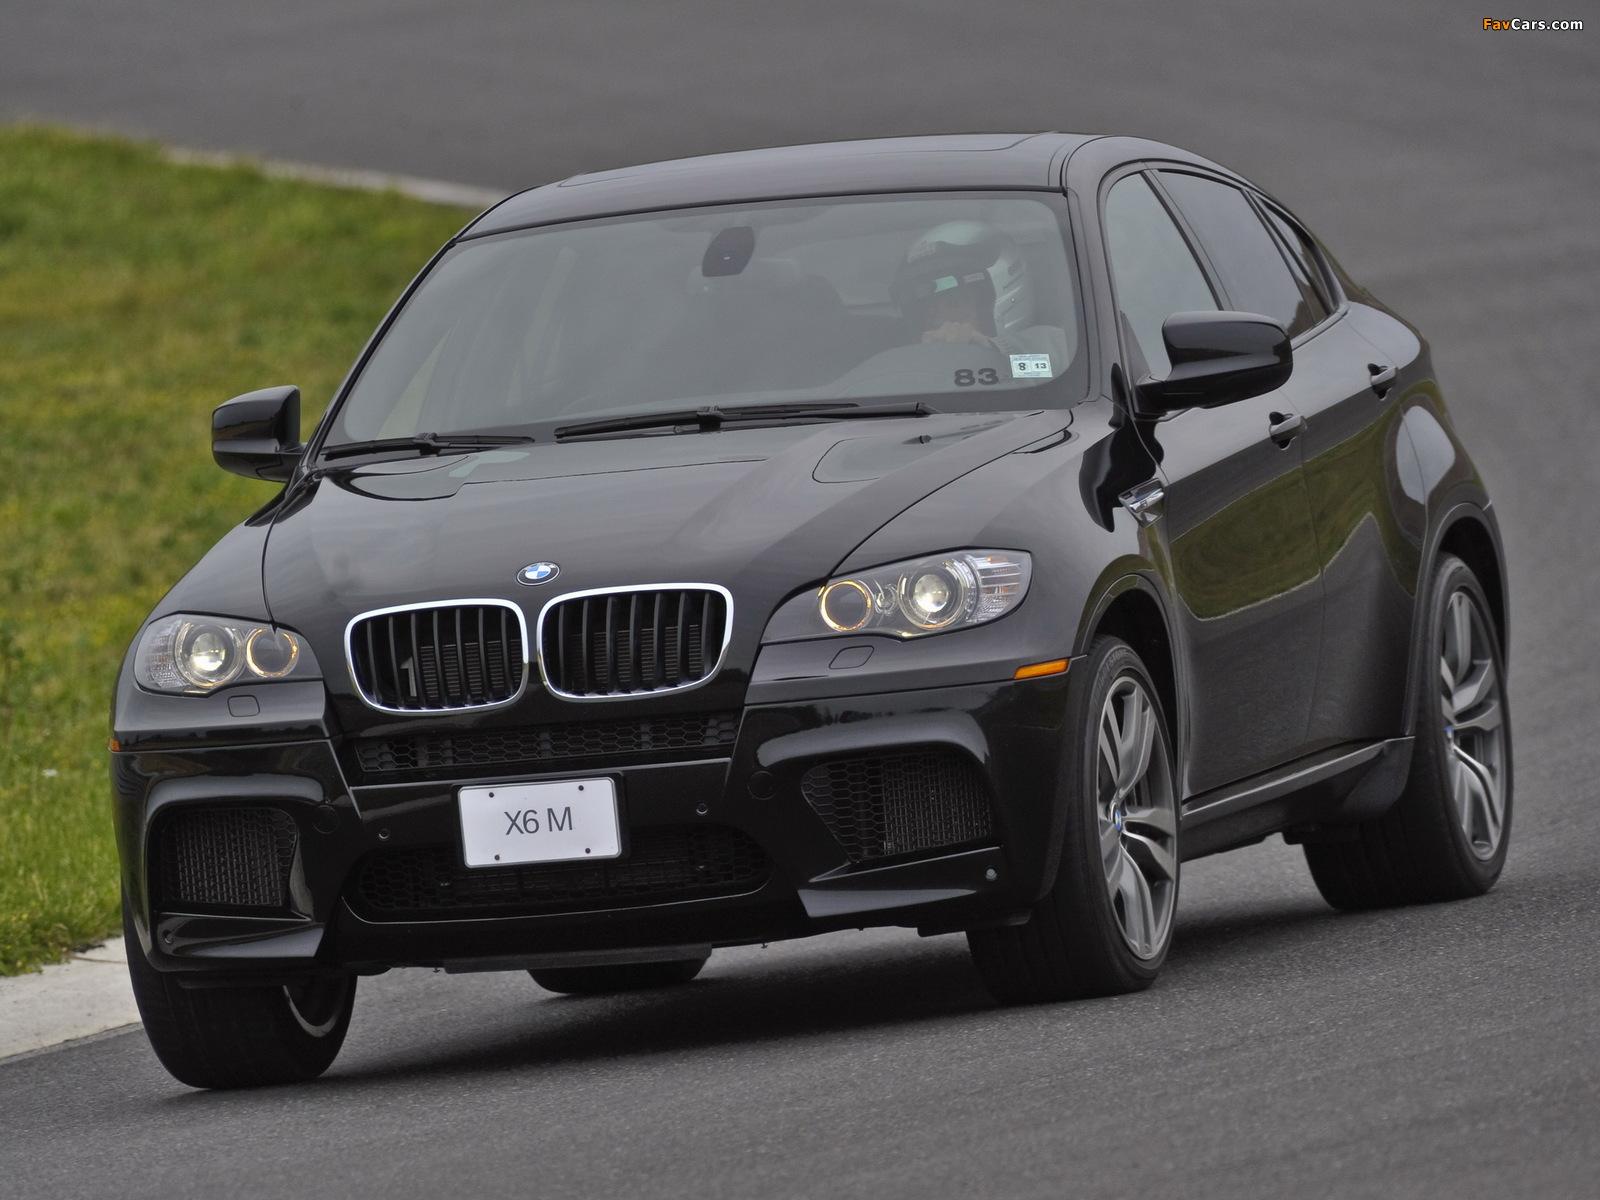 BMW X6 M US-spec (E71) 2009 photos (1600x1200)